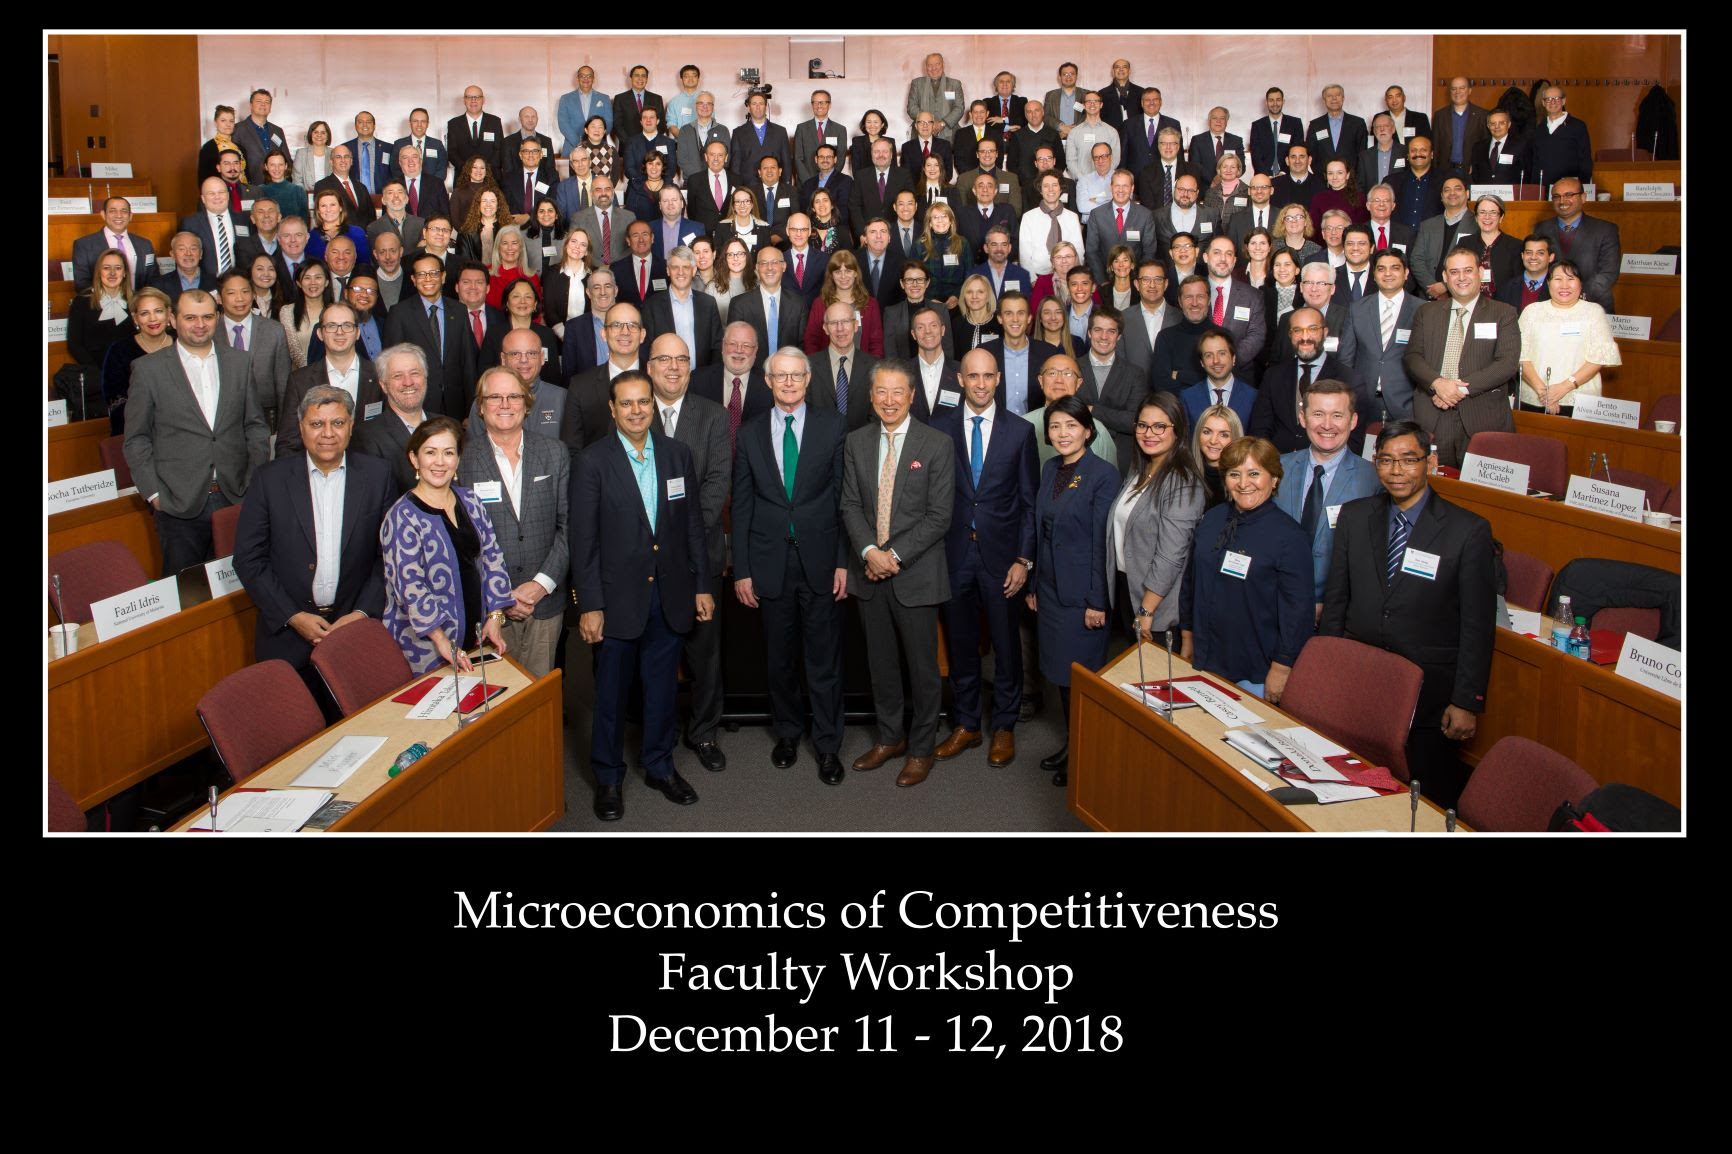 ISM Professors Attend Microeconomics of Competitiveness (MOC